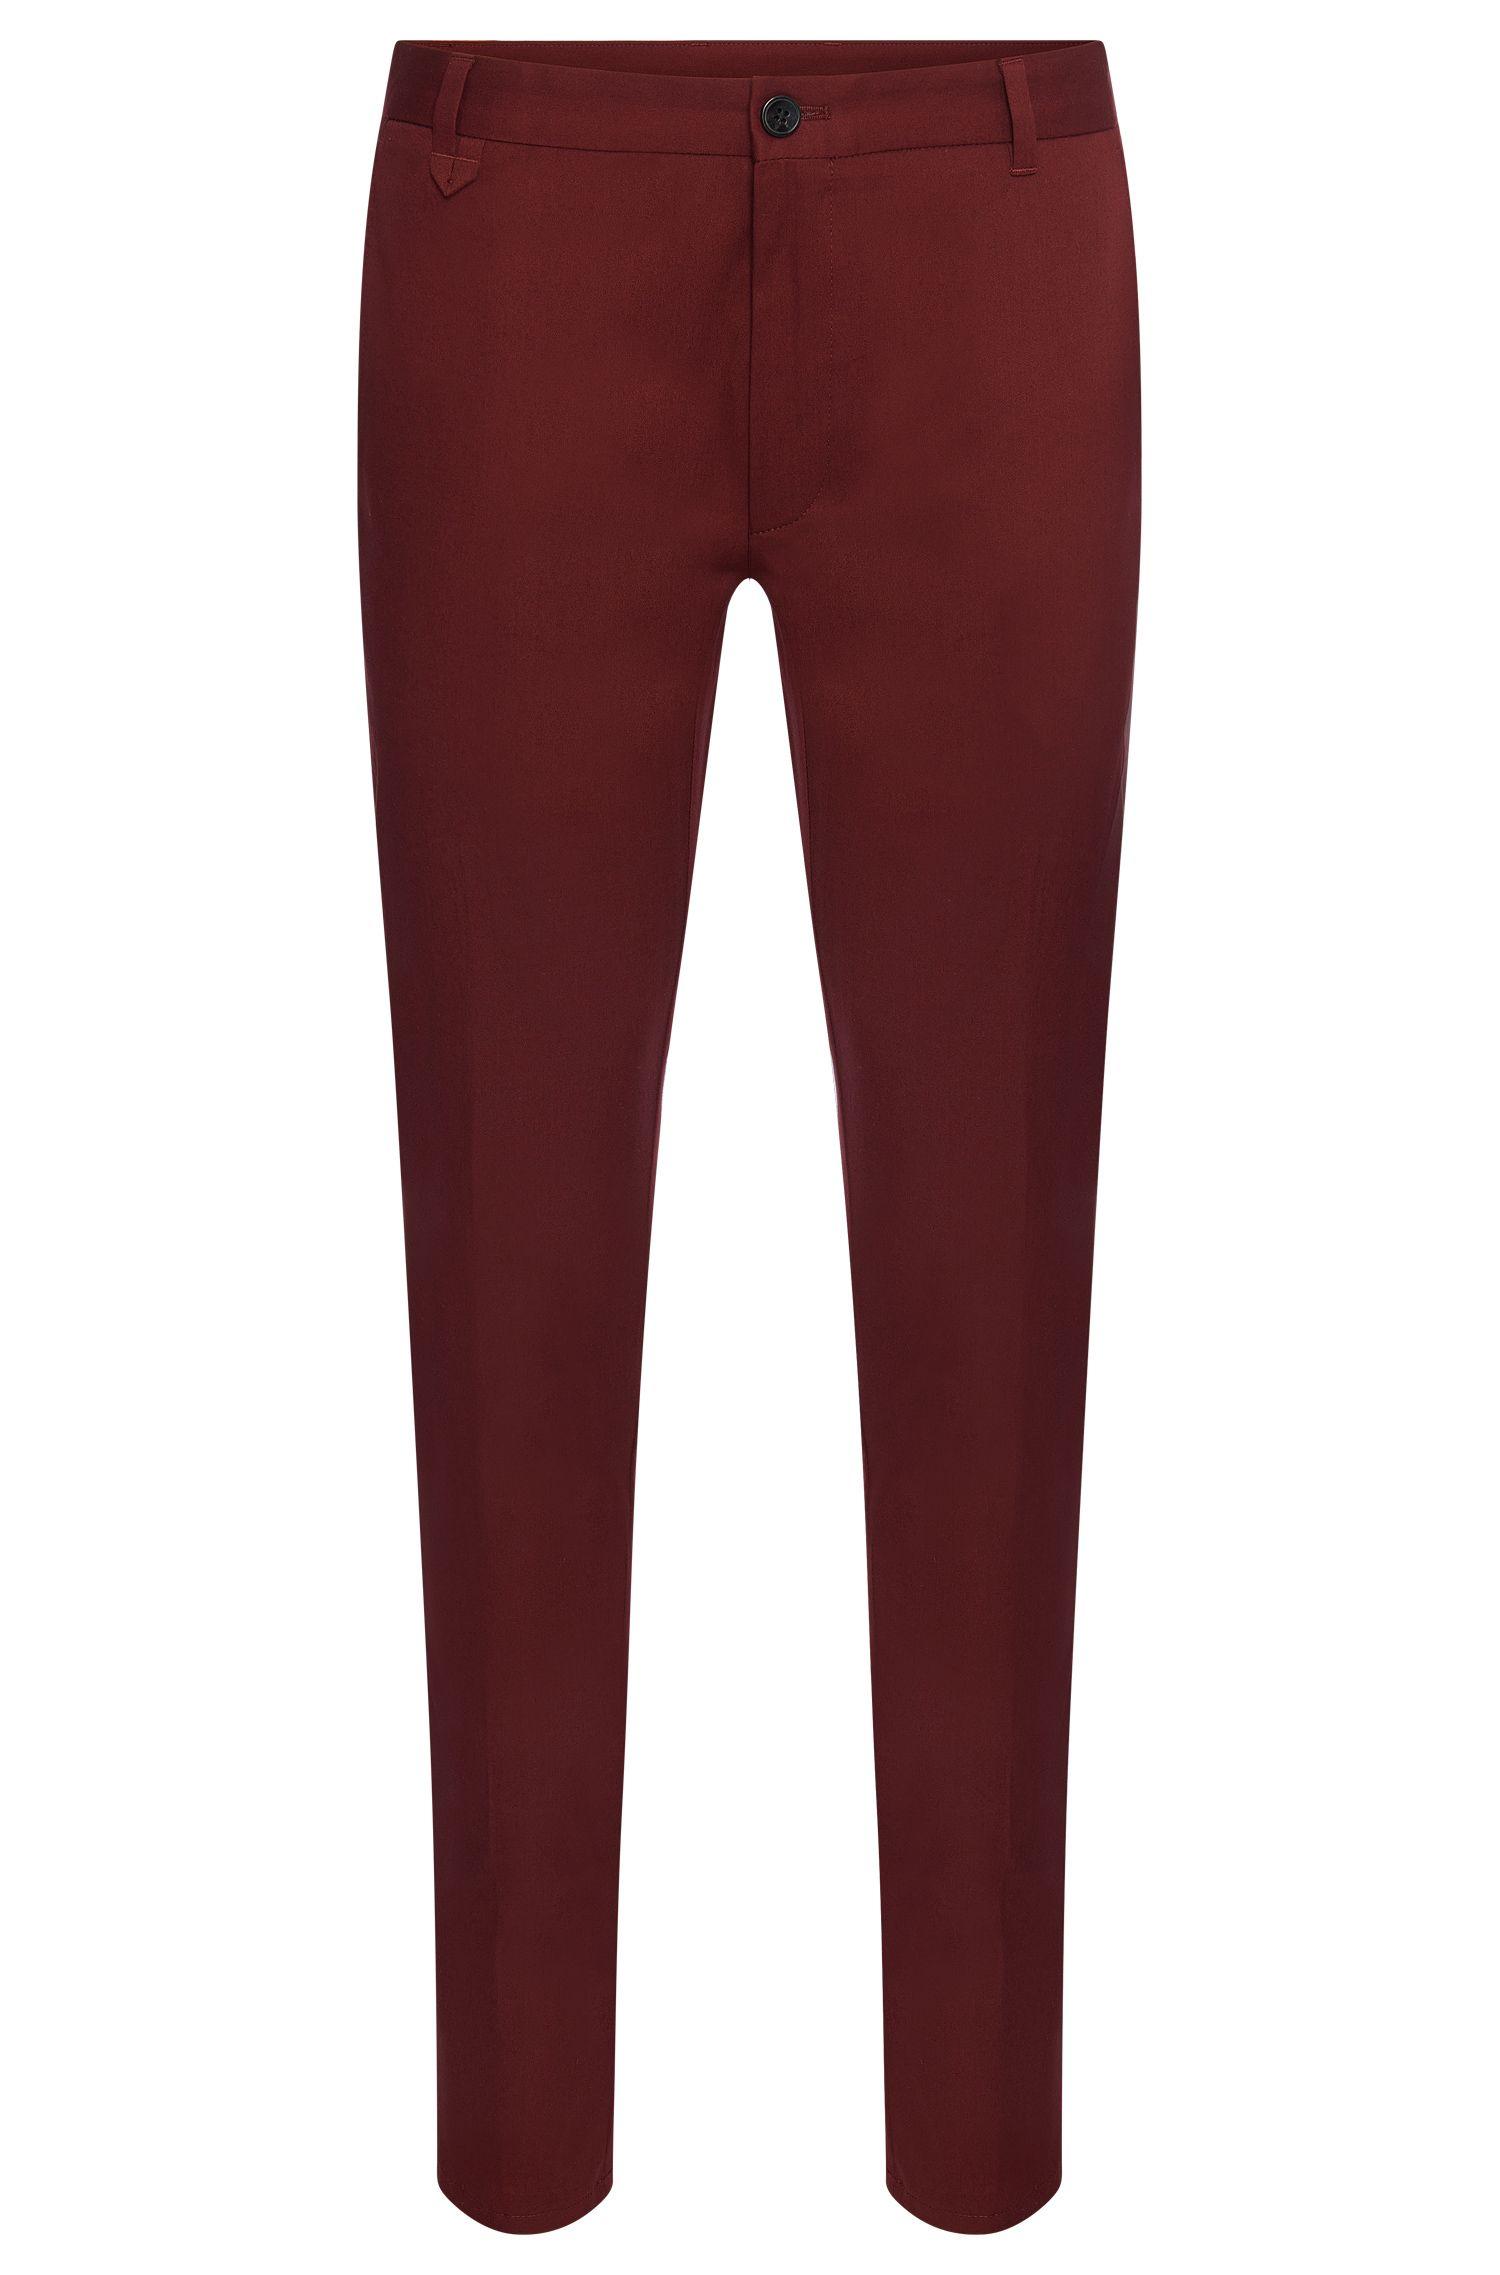 'Heldor' | Extra Slim Fit, Stretch Cotton Pants